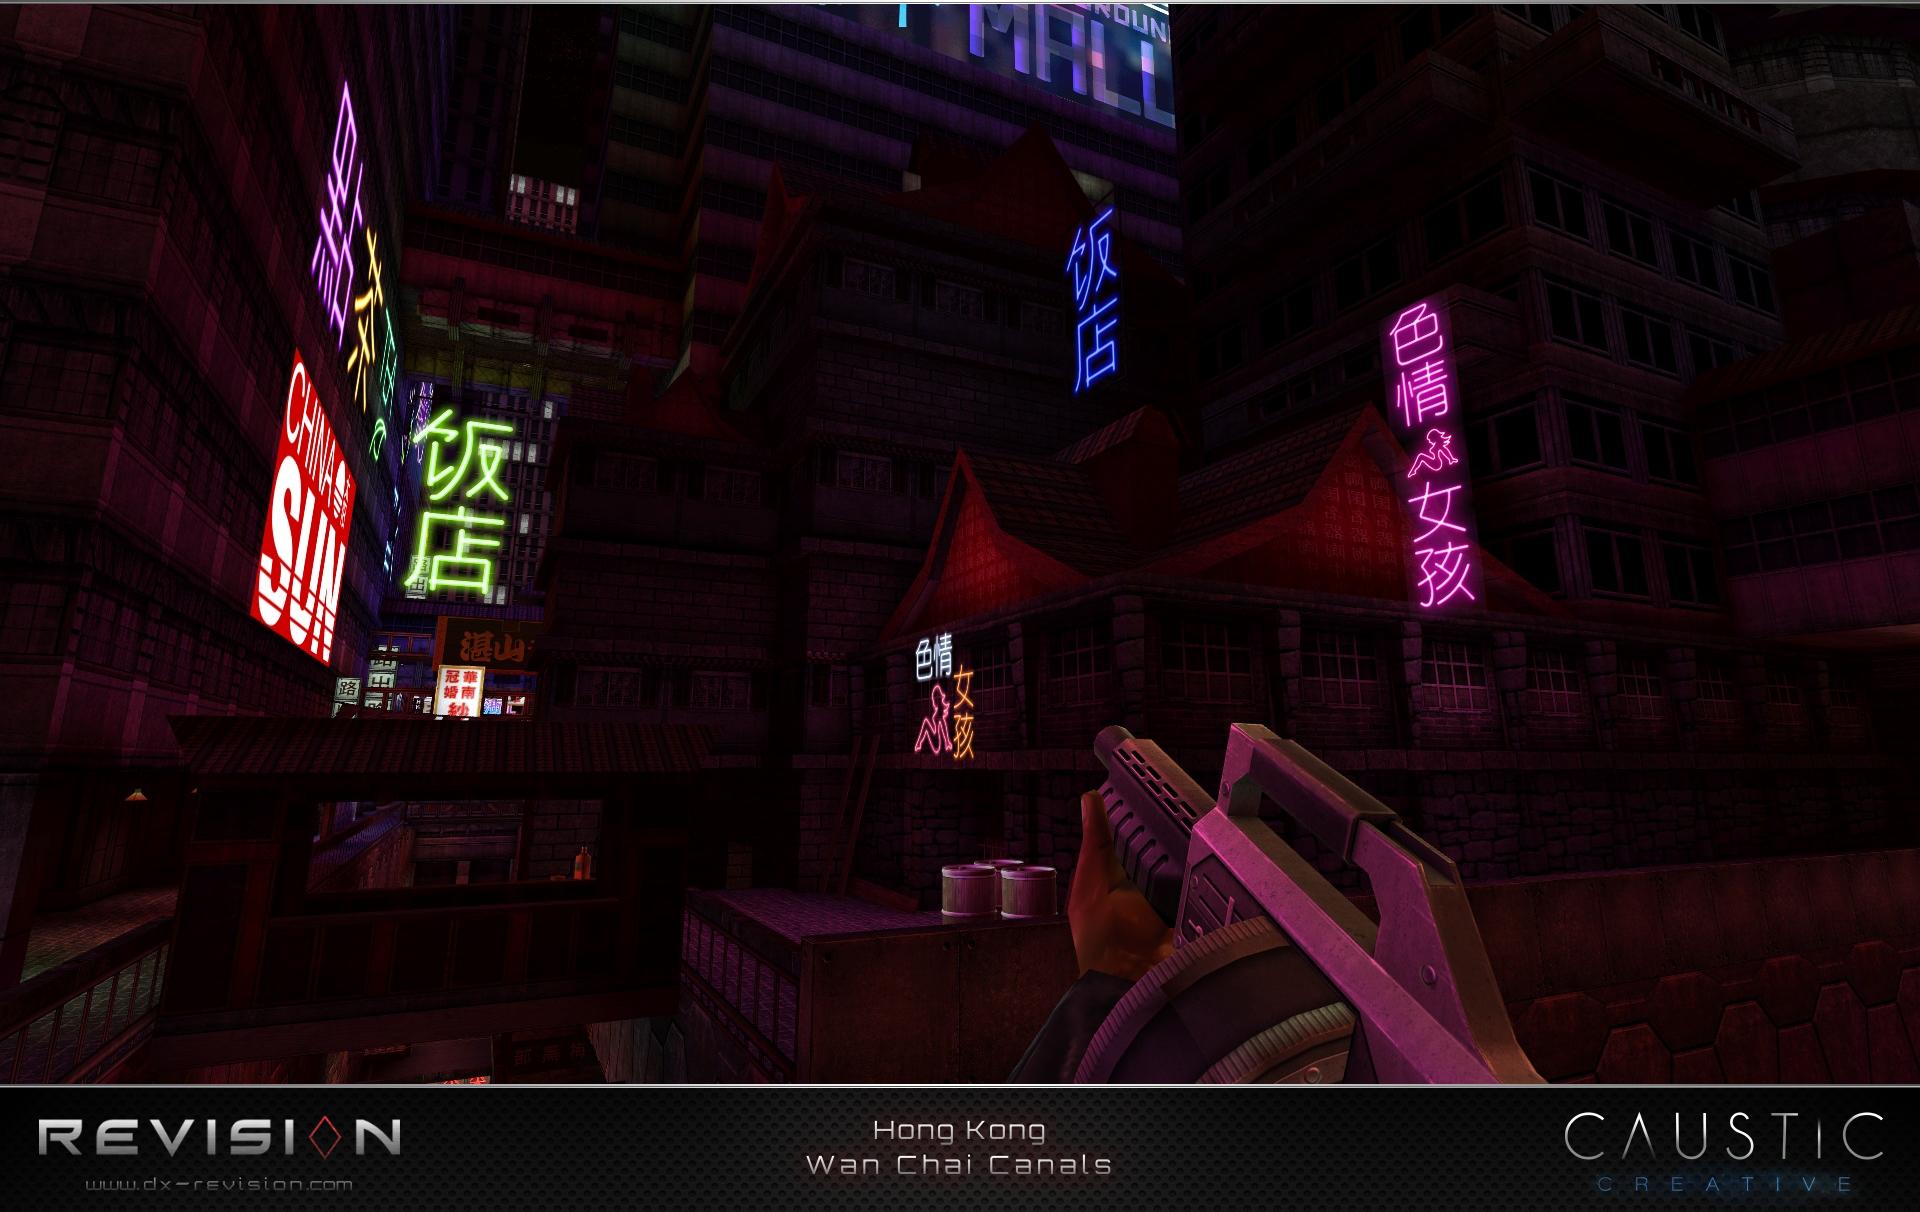 Canals Near Wan Chai Image Deus Ex Revision Mod For Deus Ex Mod Db